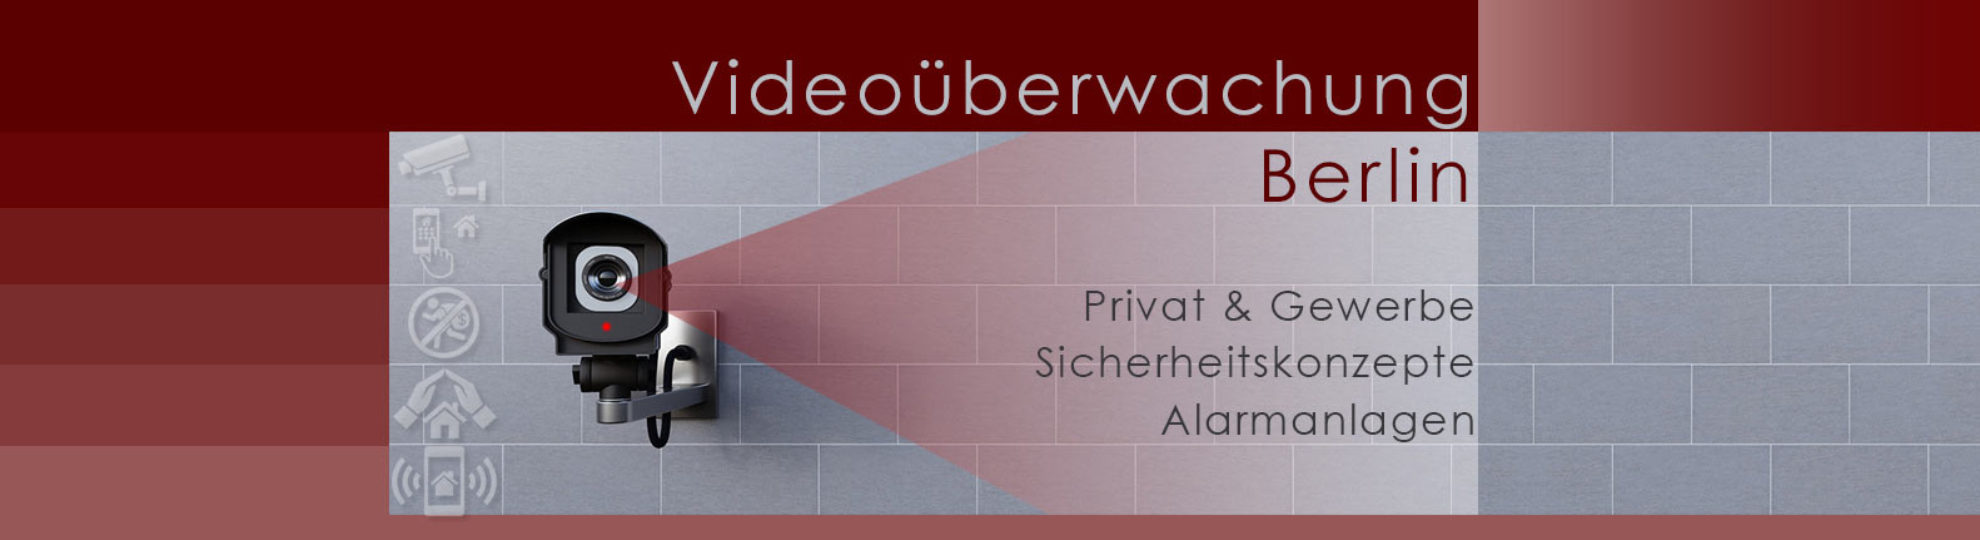 Videoüberwachungssysteme Berlin